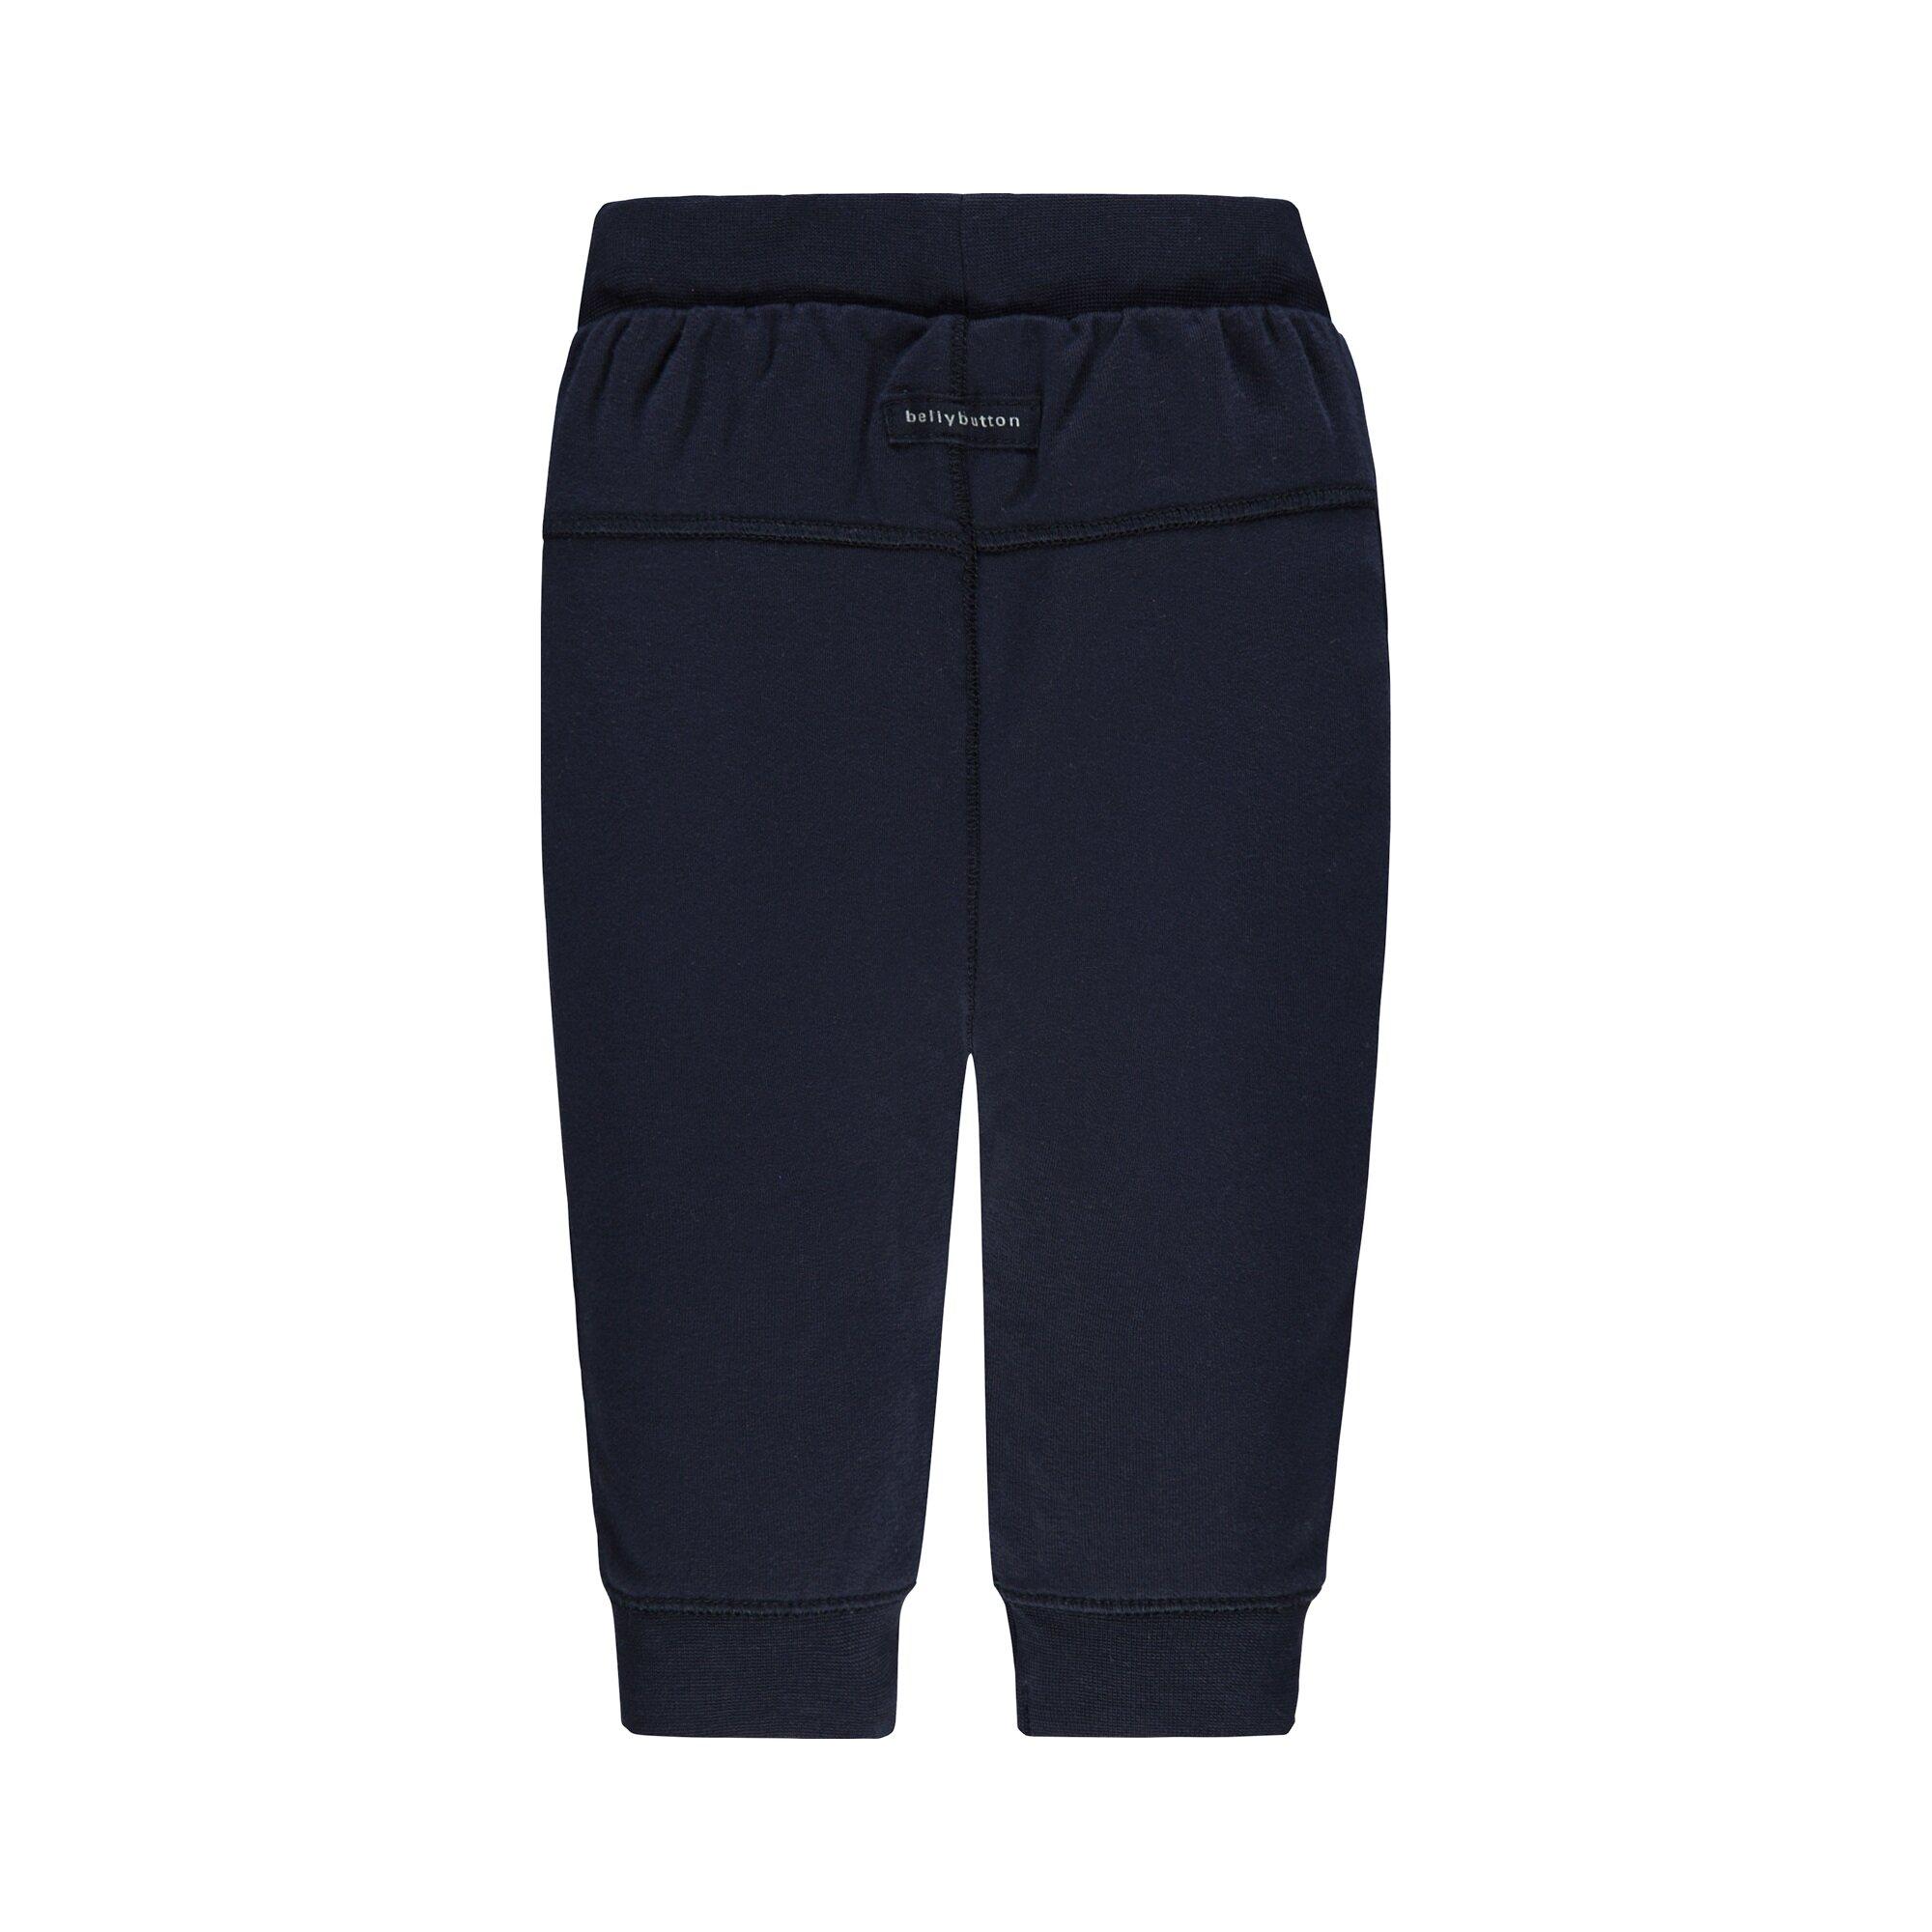 bellybutton-jogginghose-tasche